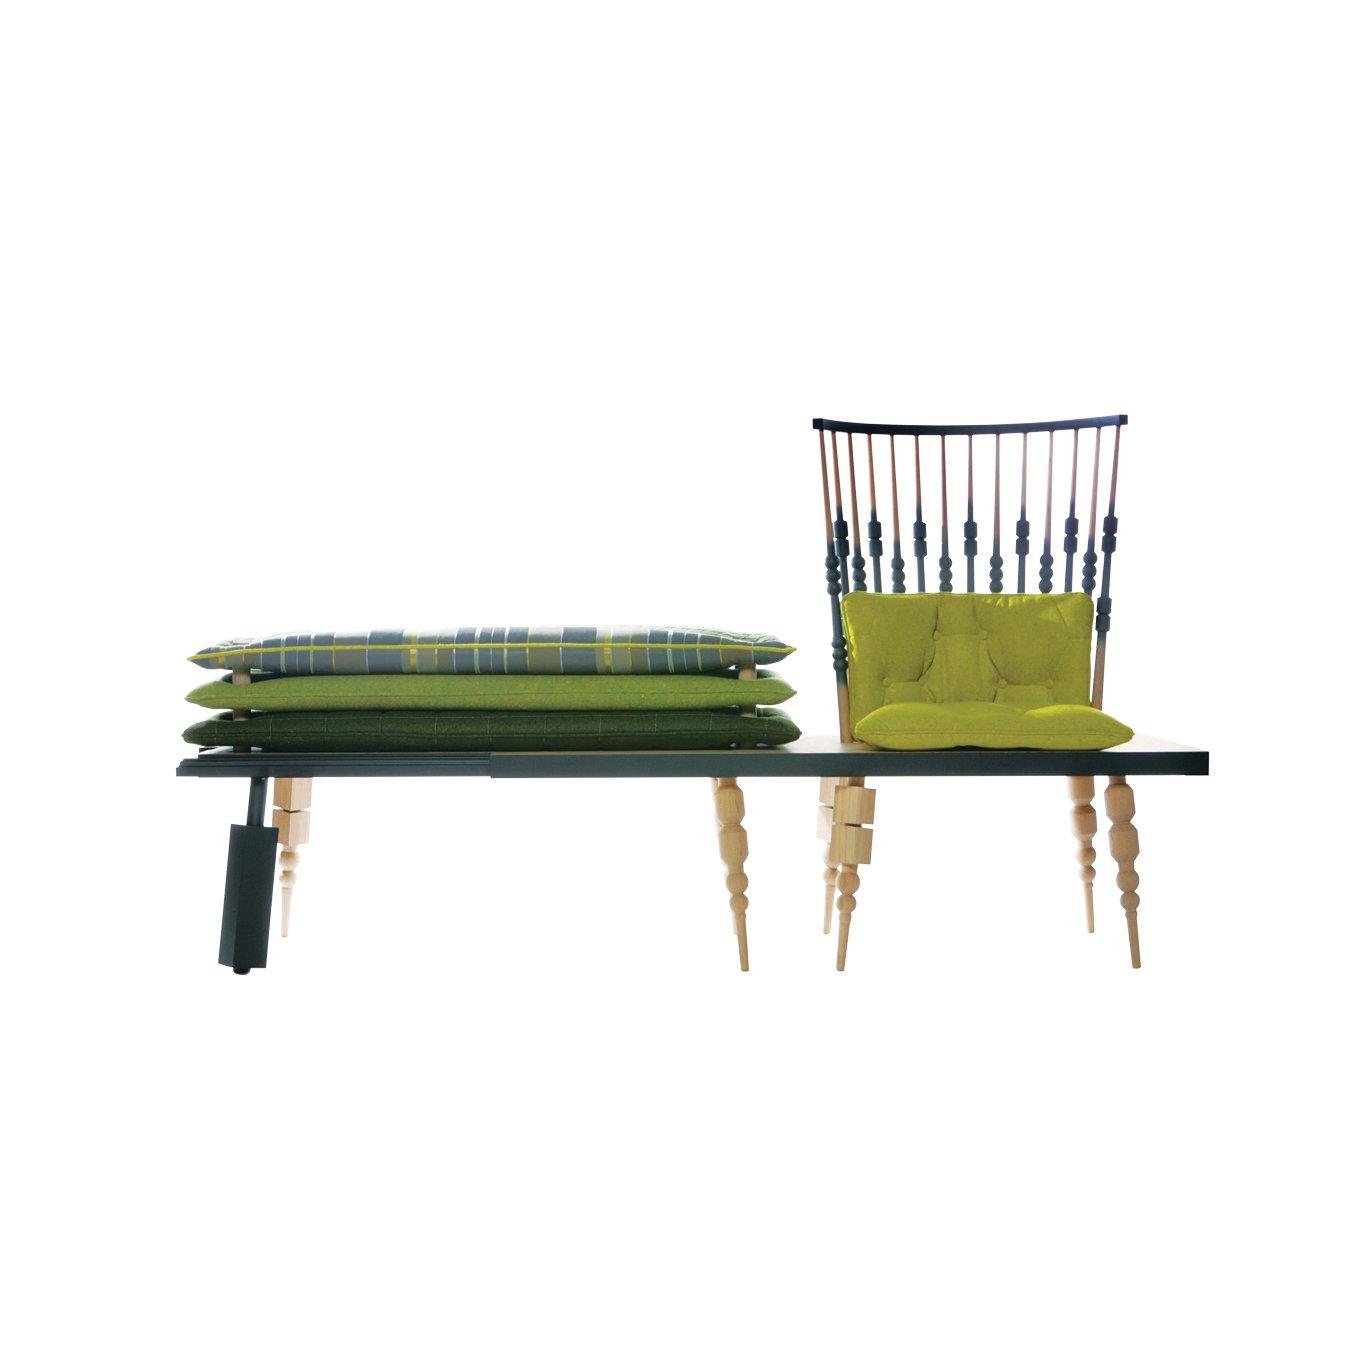 #seatingdesign #seating #chair #bench #furniture #design #WhyNotBespoke #modern #ChristopherRoy